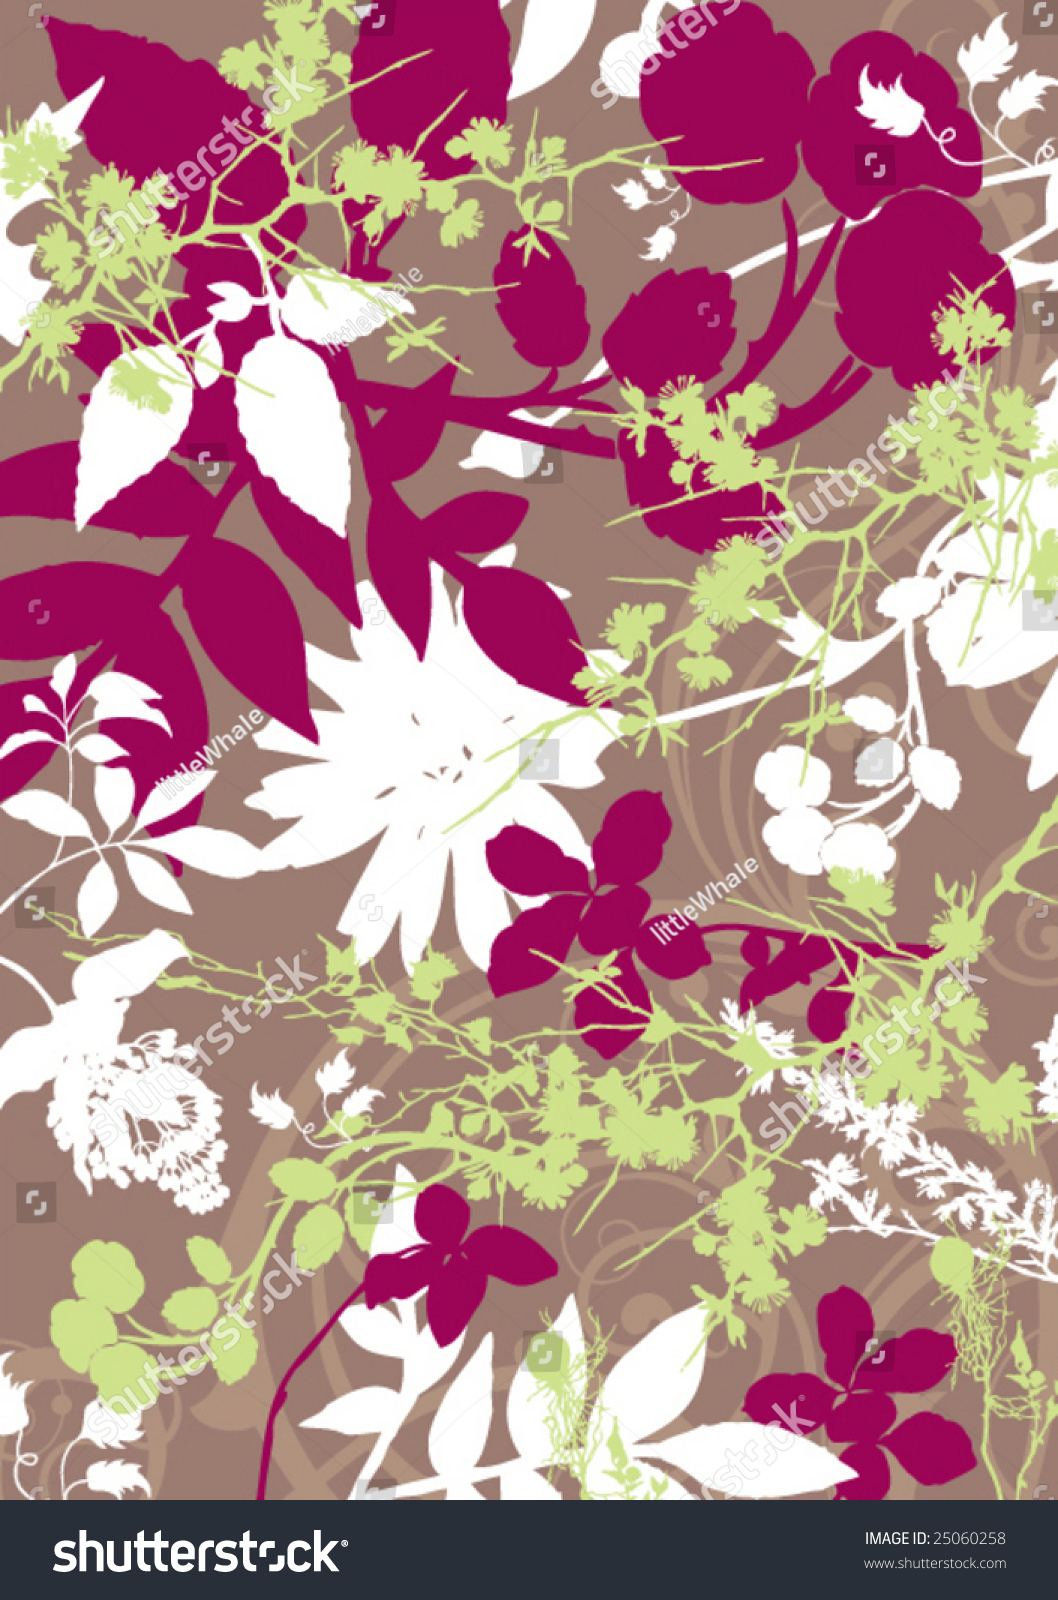 Retro Floral Wallpaper Stock Vector Royalty Free 25060258